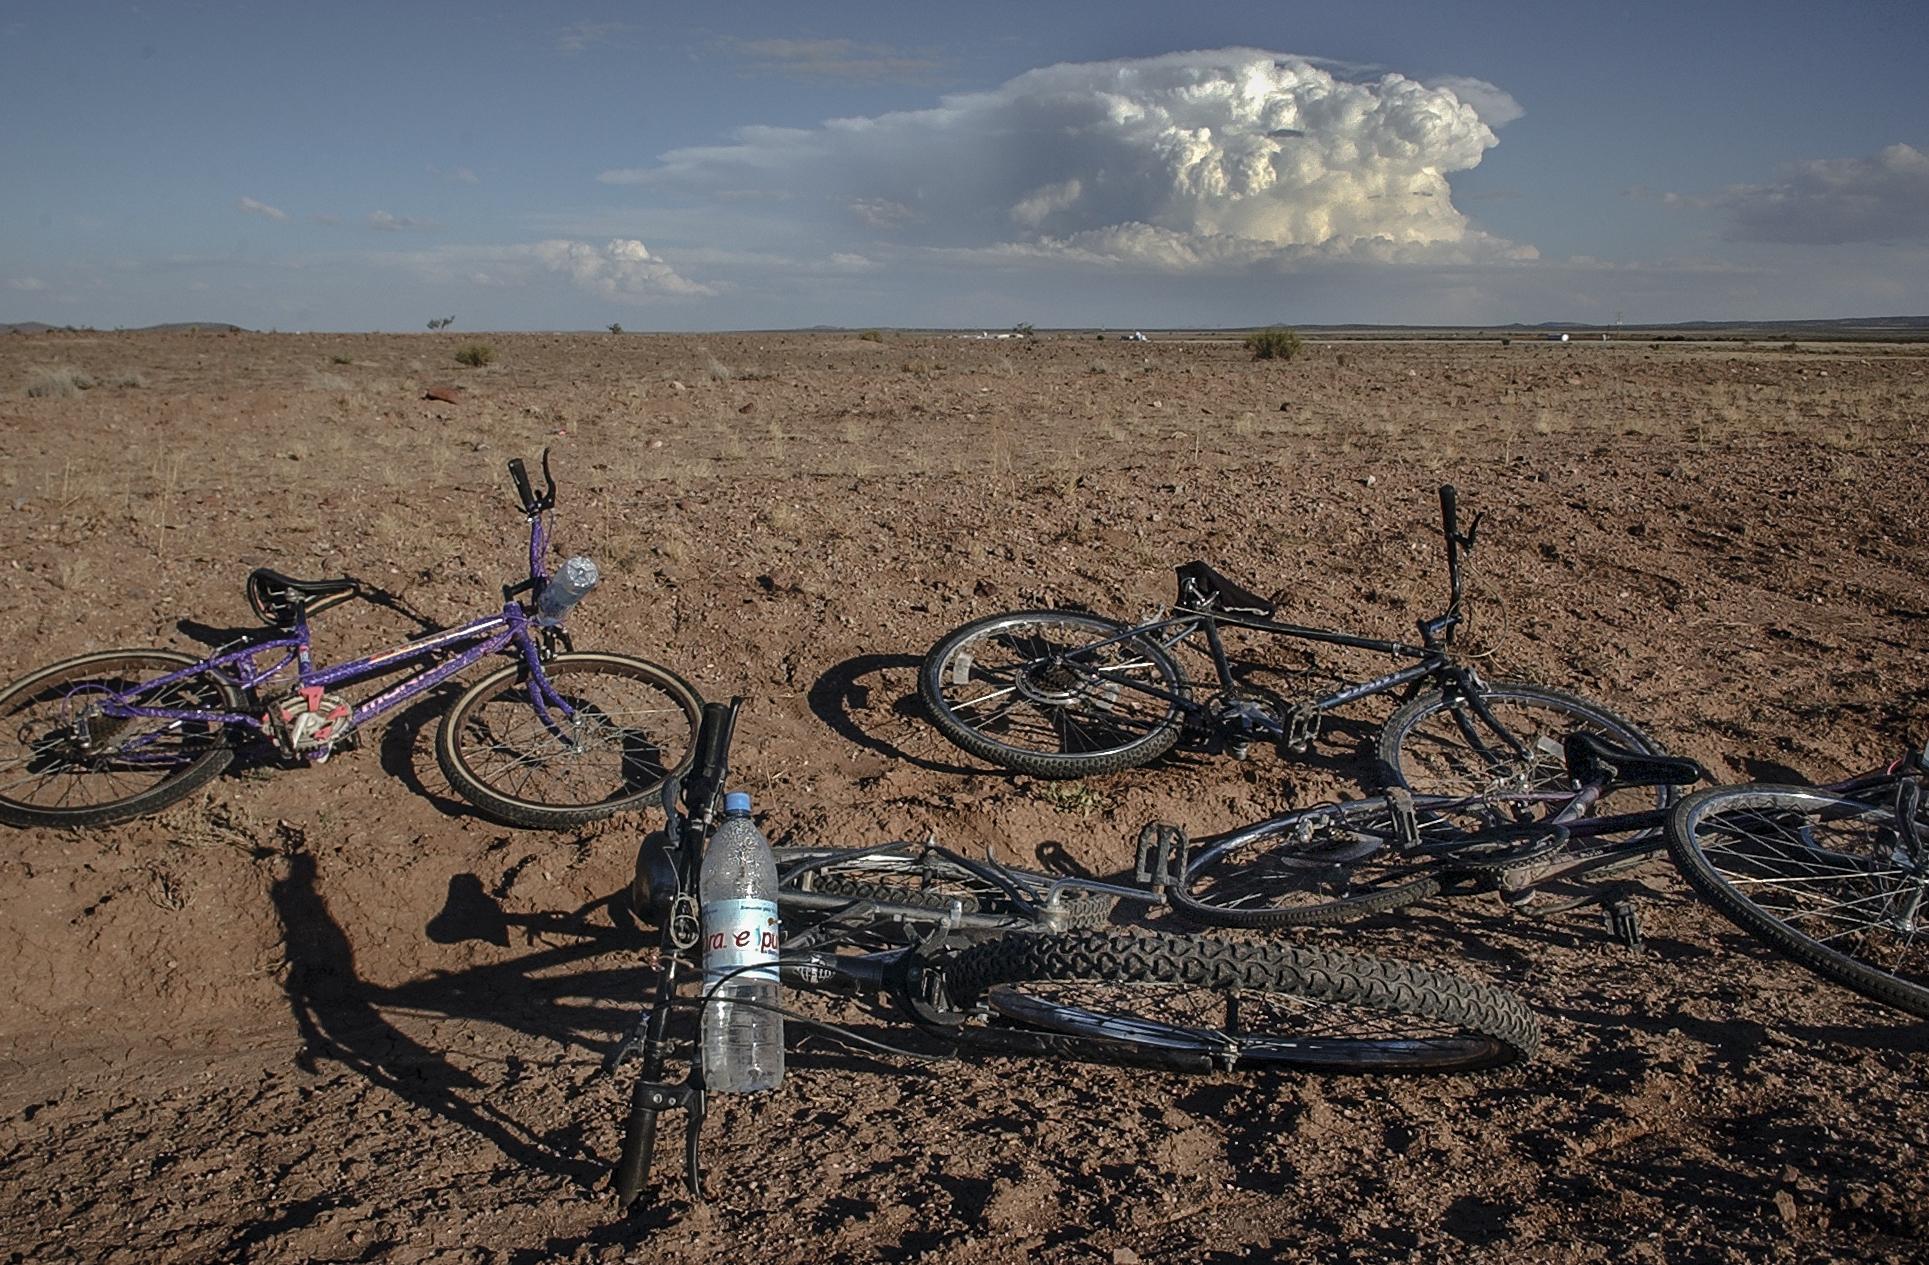 Left in the desert in New Mexico.